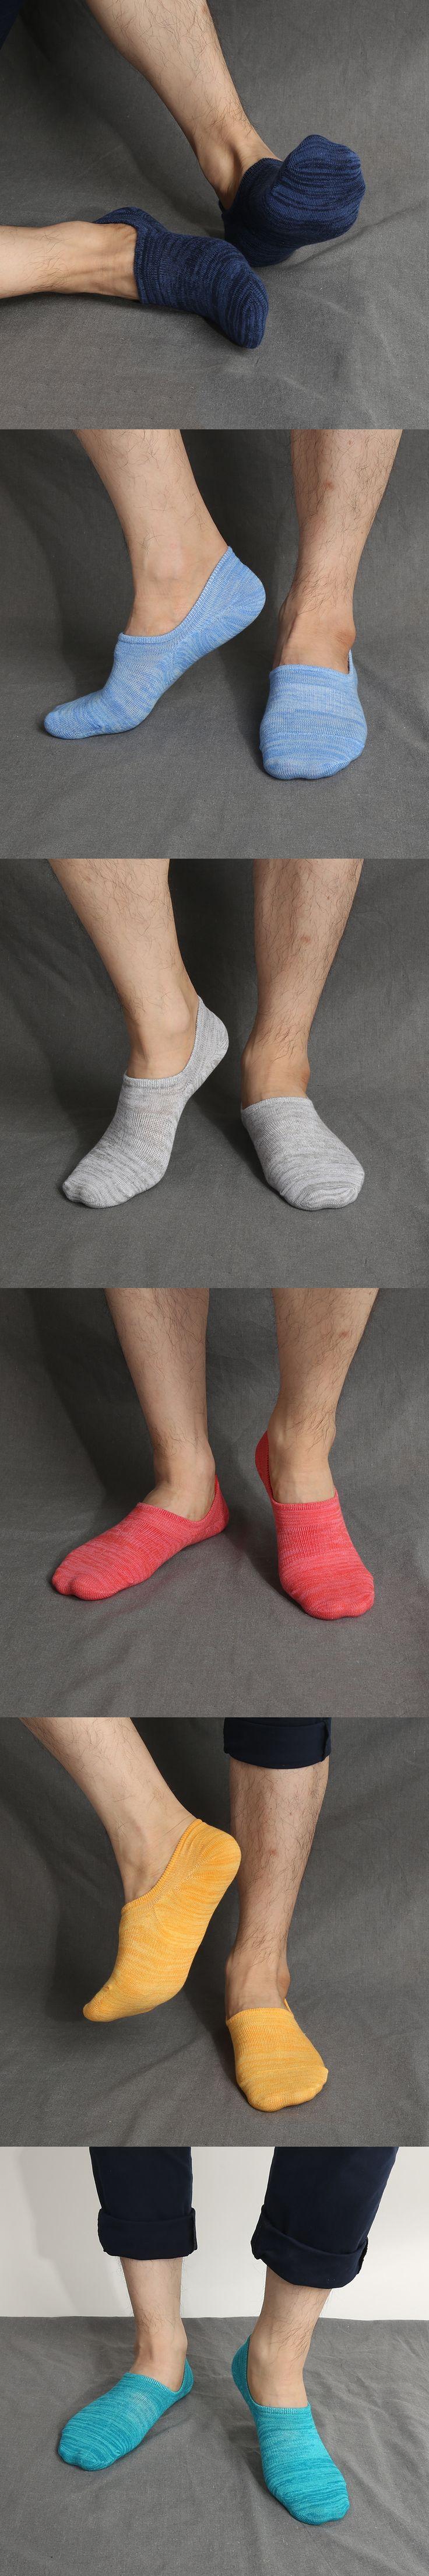 1Pair Breathable Summer Silicone Anti-slip Men Short Socks Retro Invisible Socks Casual Cotton Thin Socks 6 Colors Available